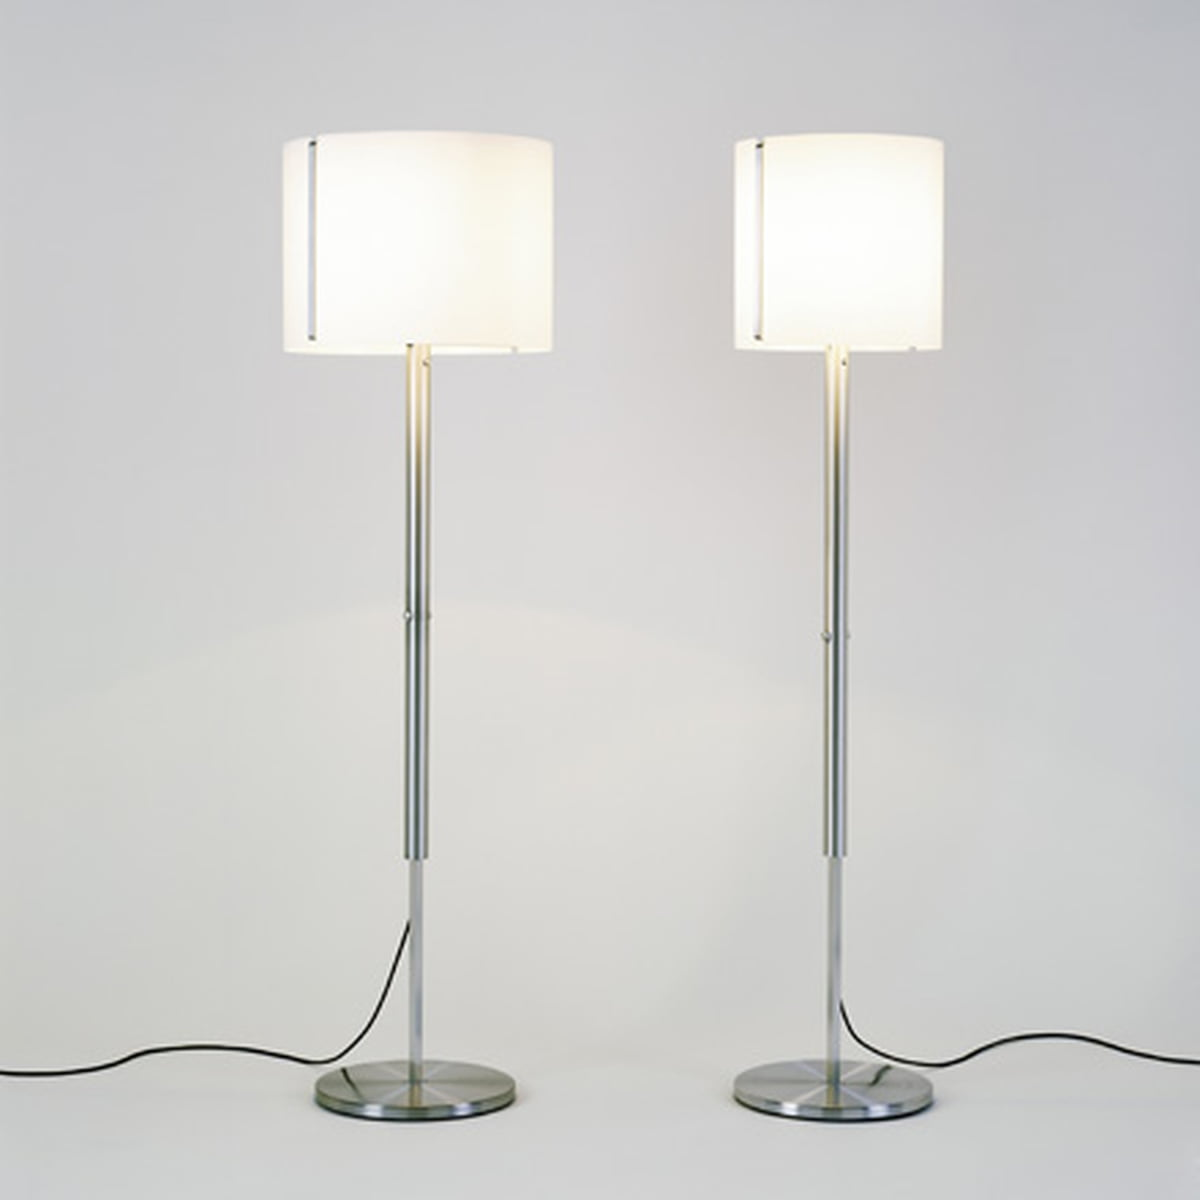 serien lighting jones master floor lamp. Black Bedroom Furniture Sets. Home Design Ideas